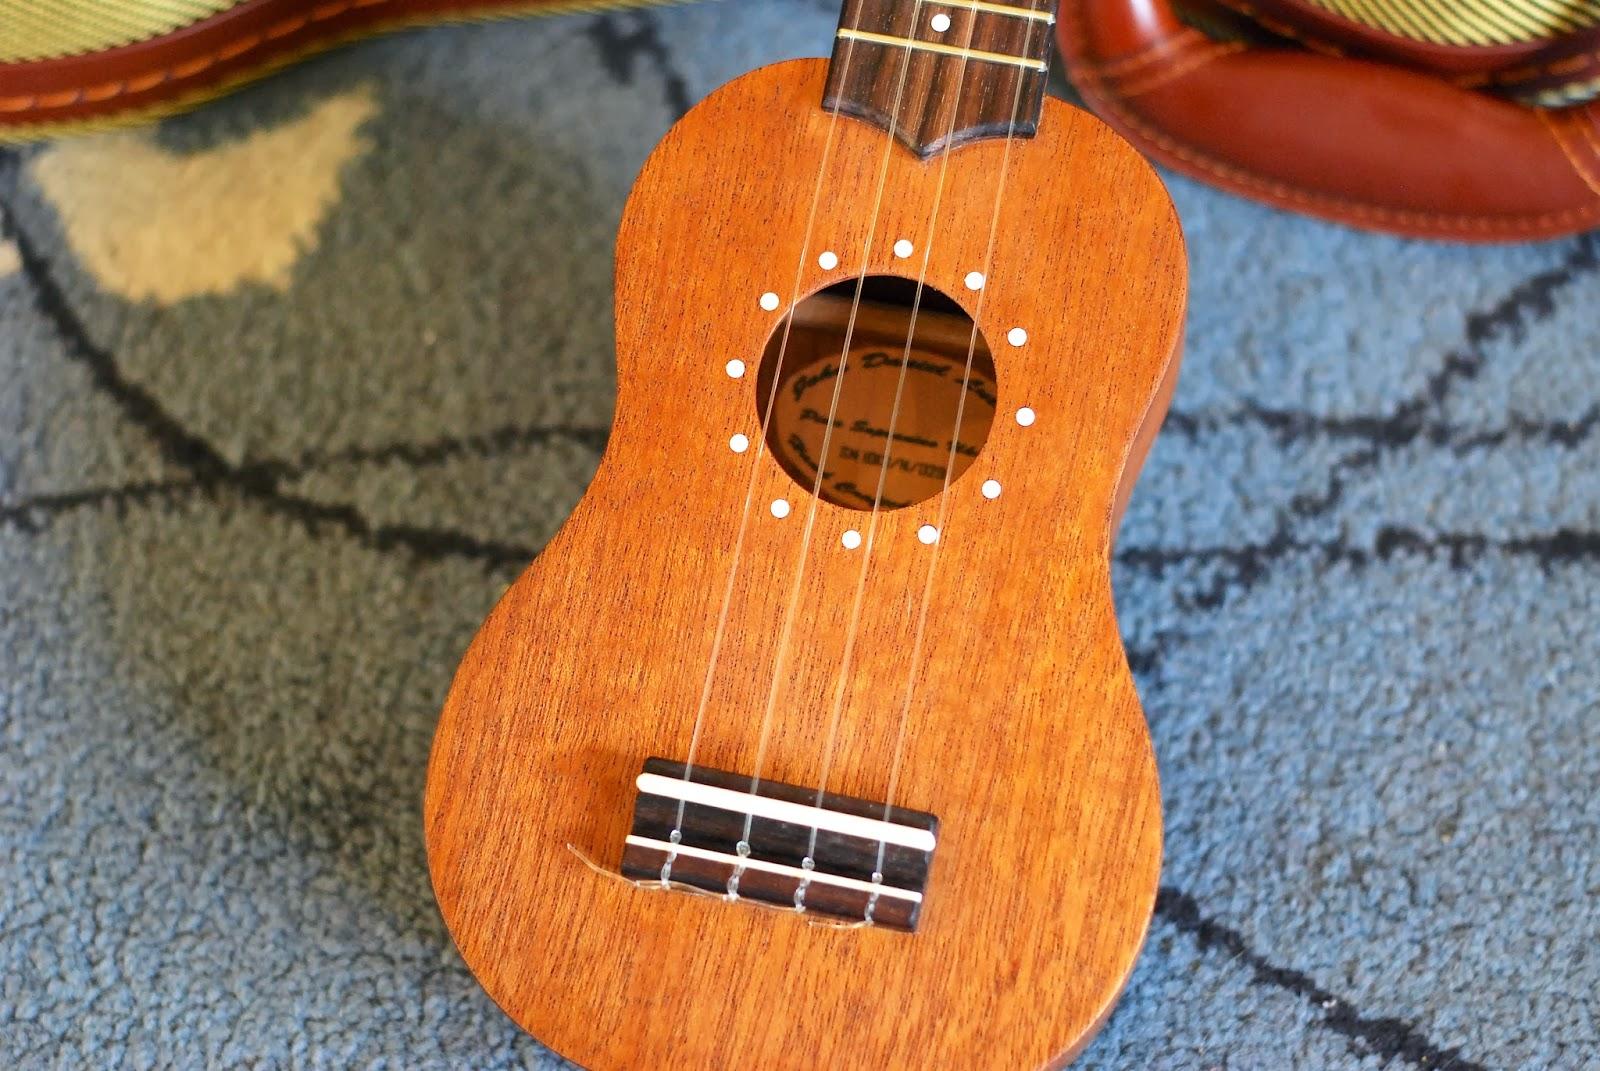 John Daniel Pixie Sopranino ukulele body